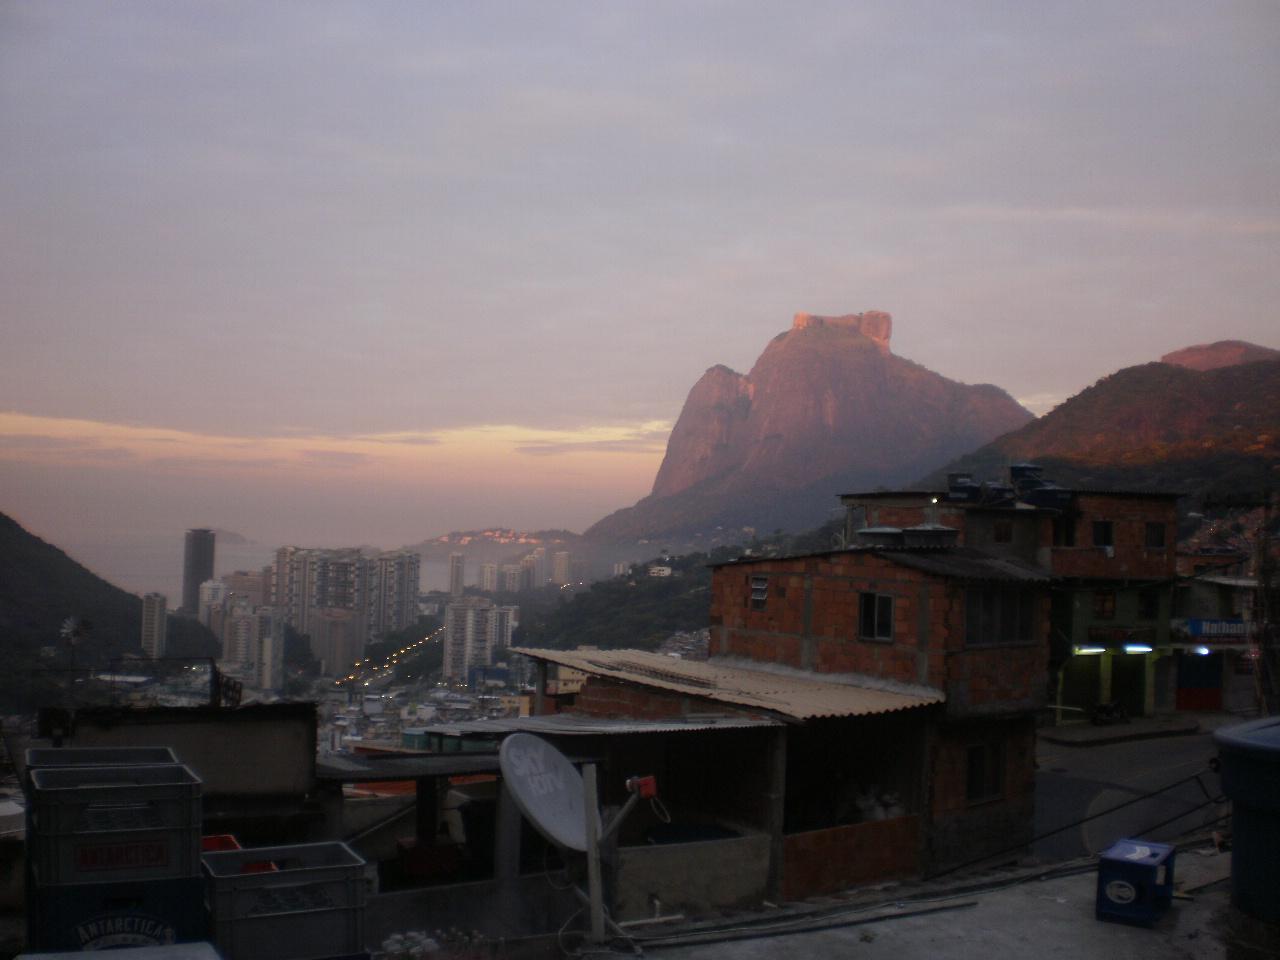 Alba della favela Rocinha #Finestrasullafavela